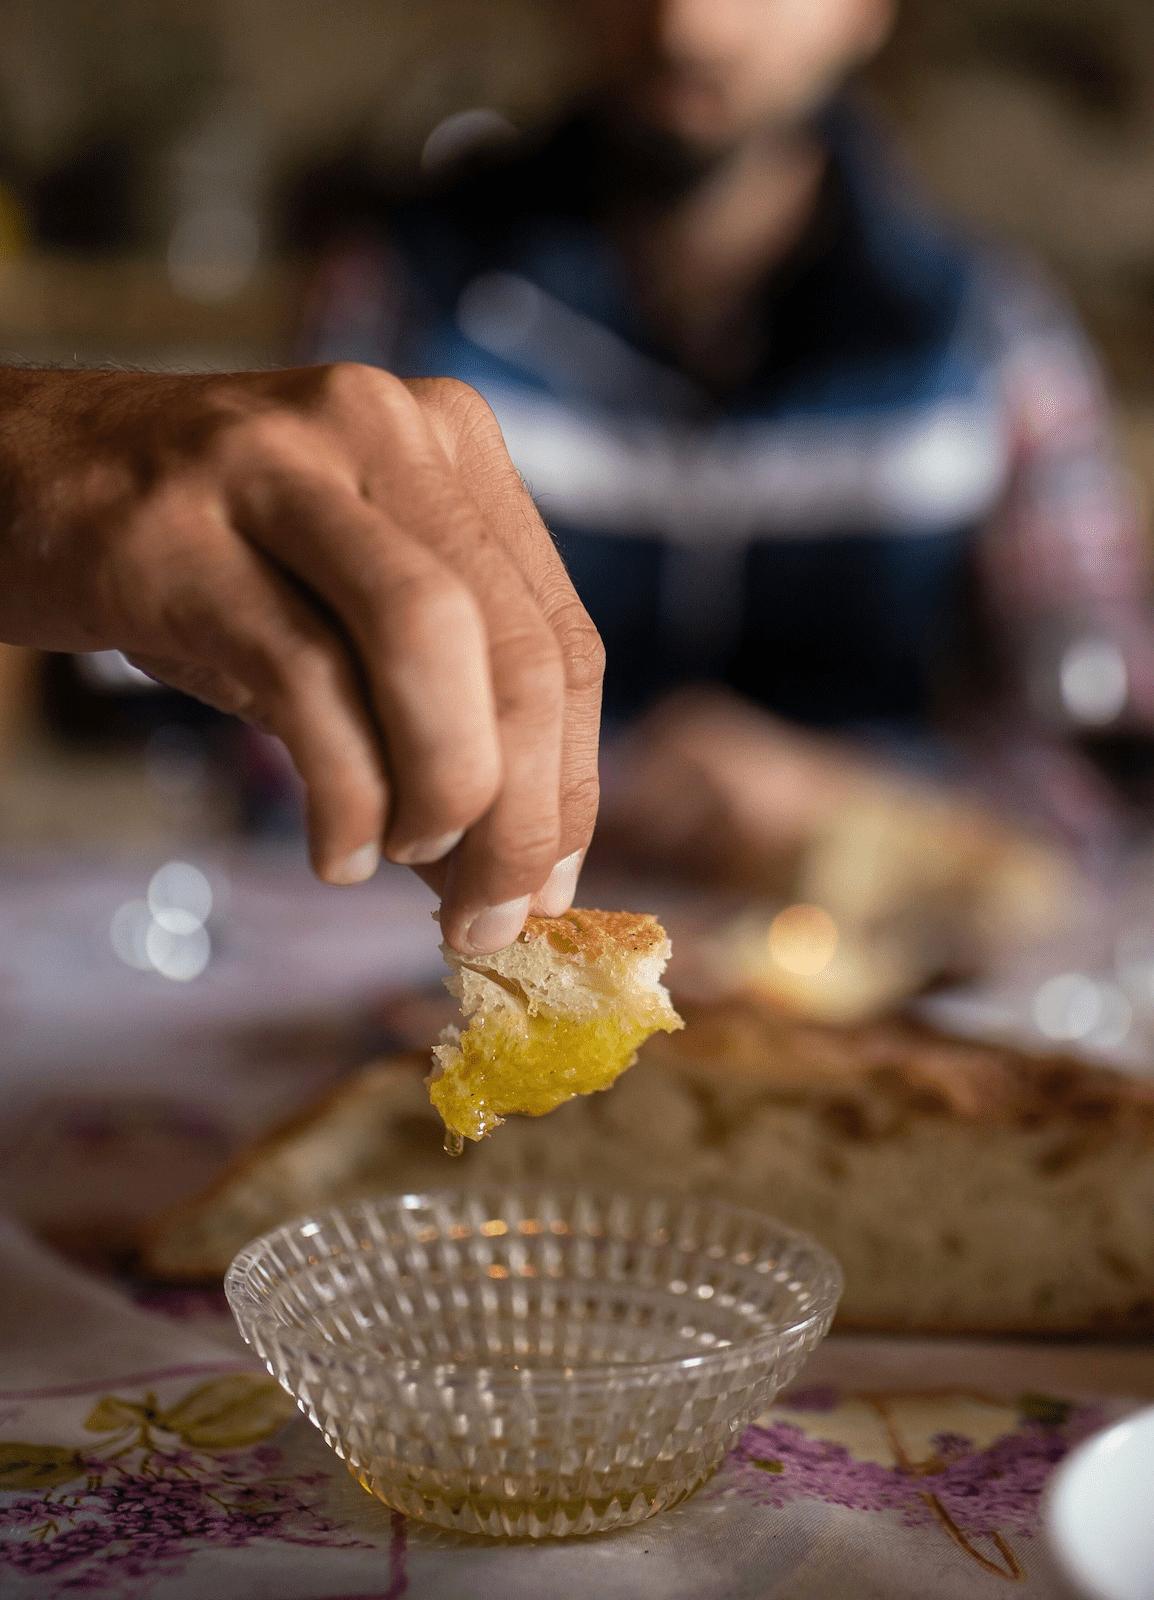 oil Mediterranean cooking class